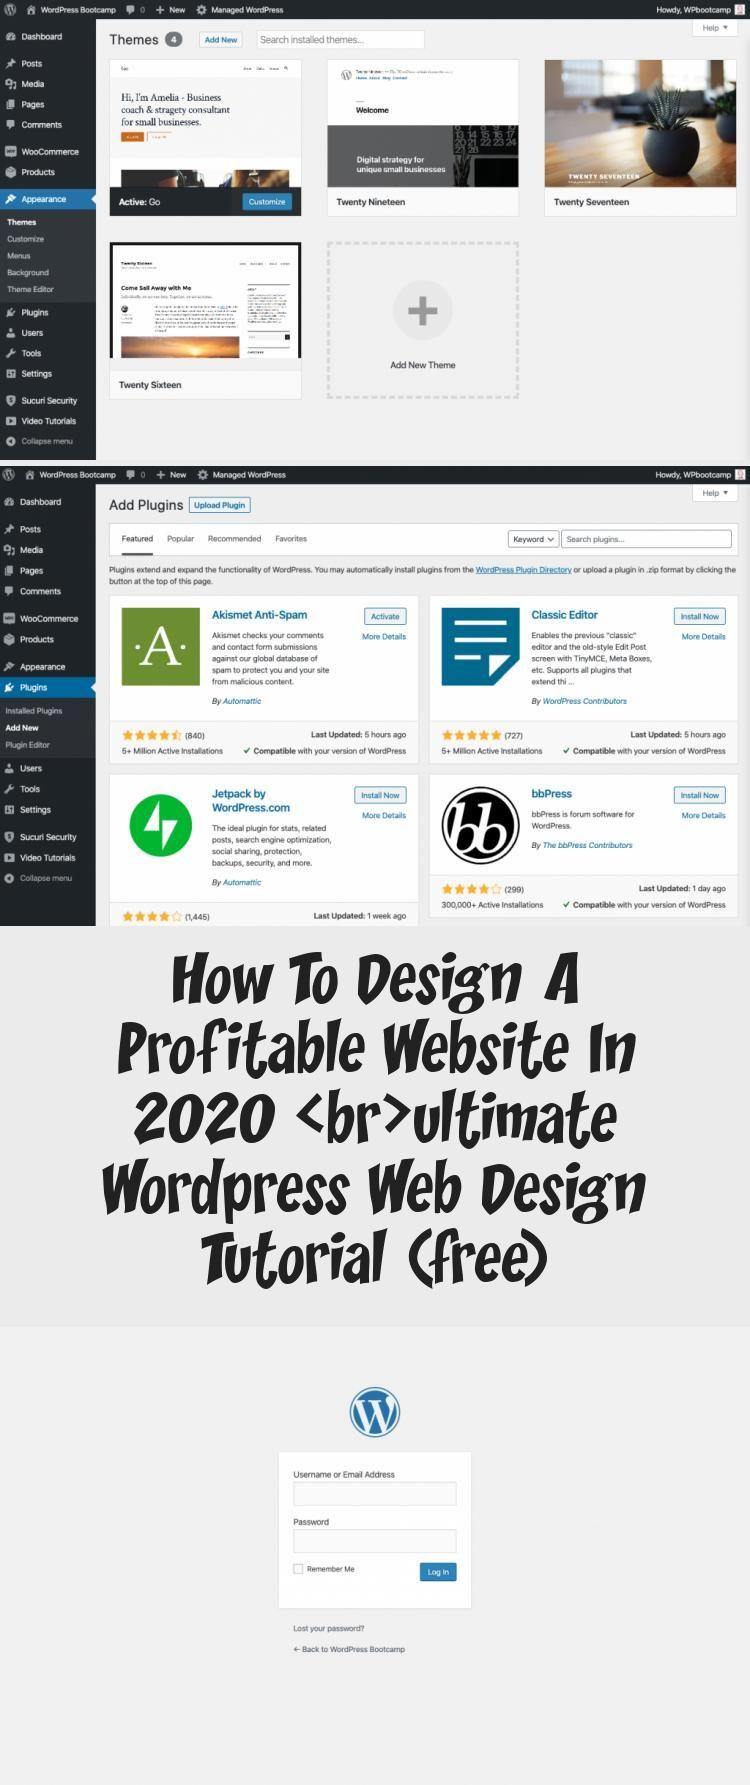 En Blog En Blog In 2020 Wordpress Web Design Web Design Tutorials Design Tutorials